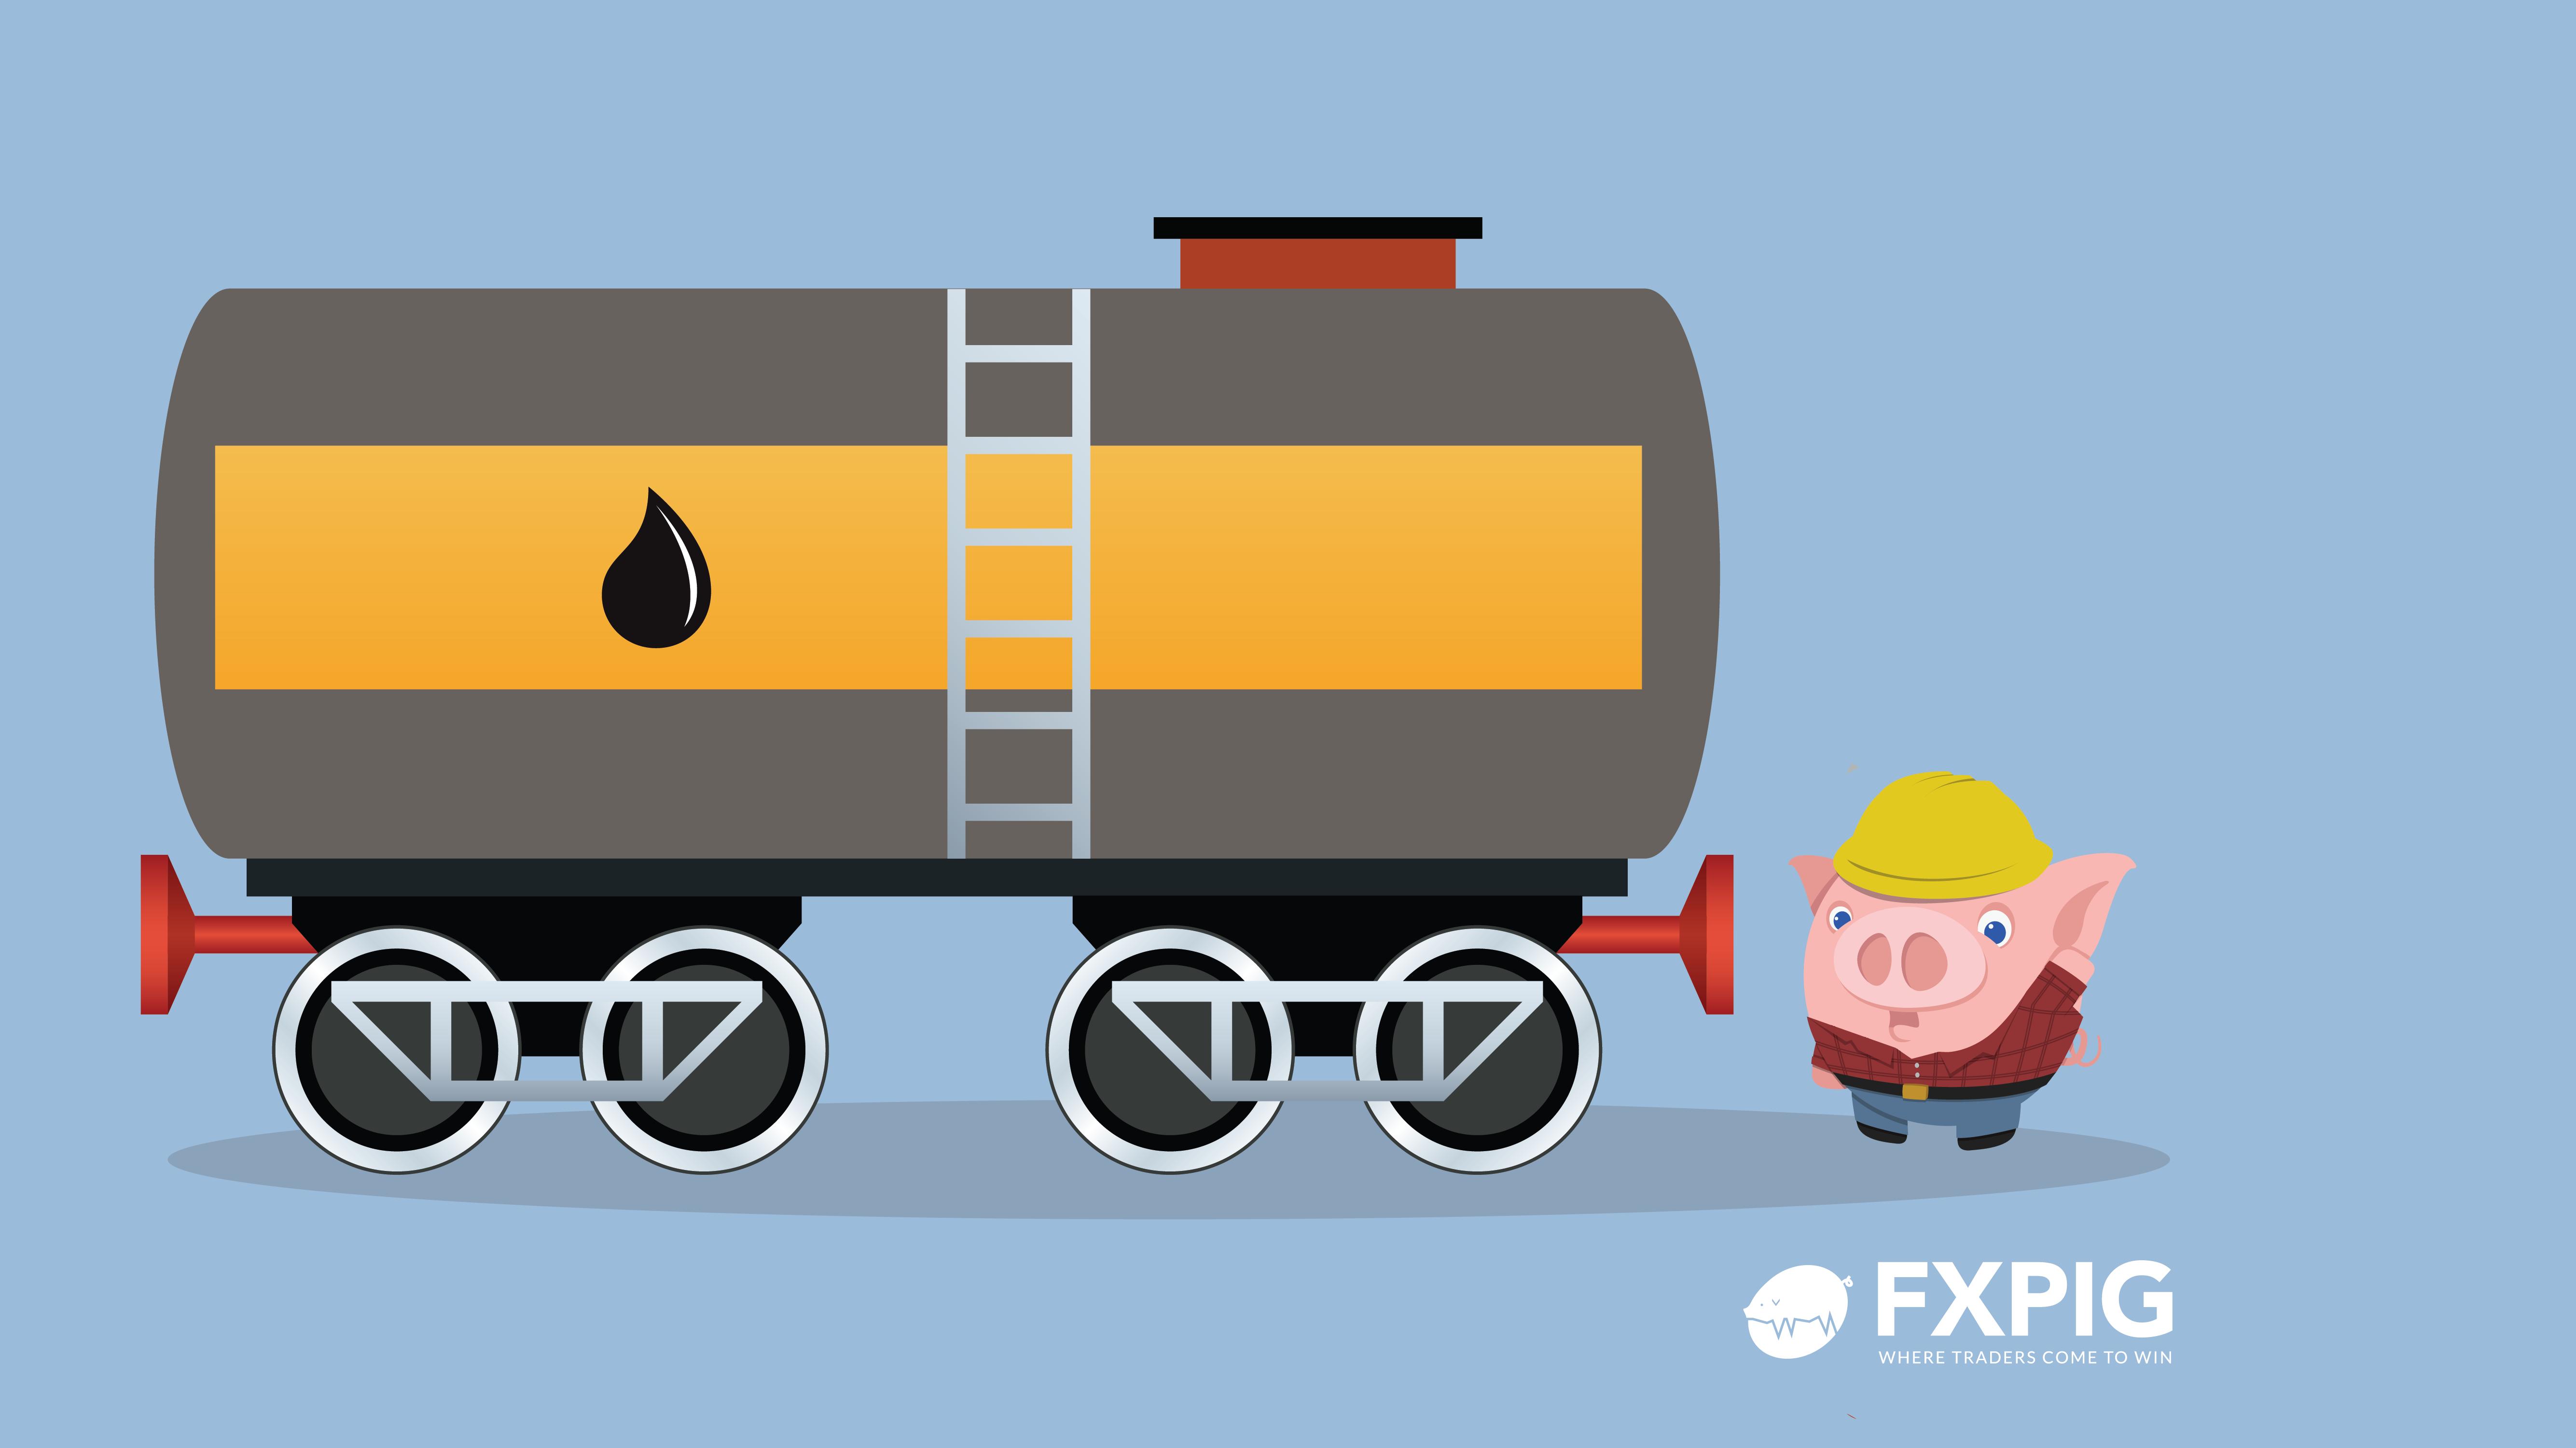 Forex_Trading_Fx_Trader_FXPIG_OIL